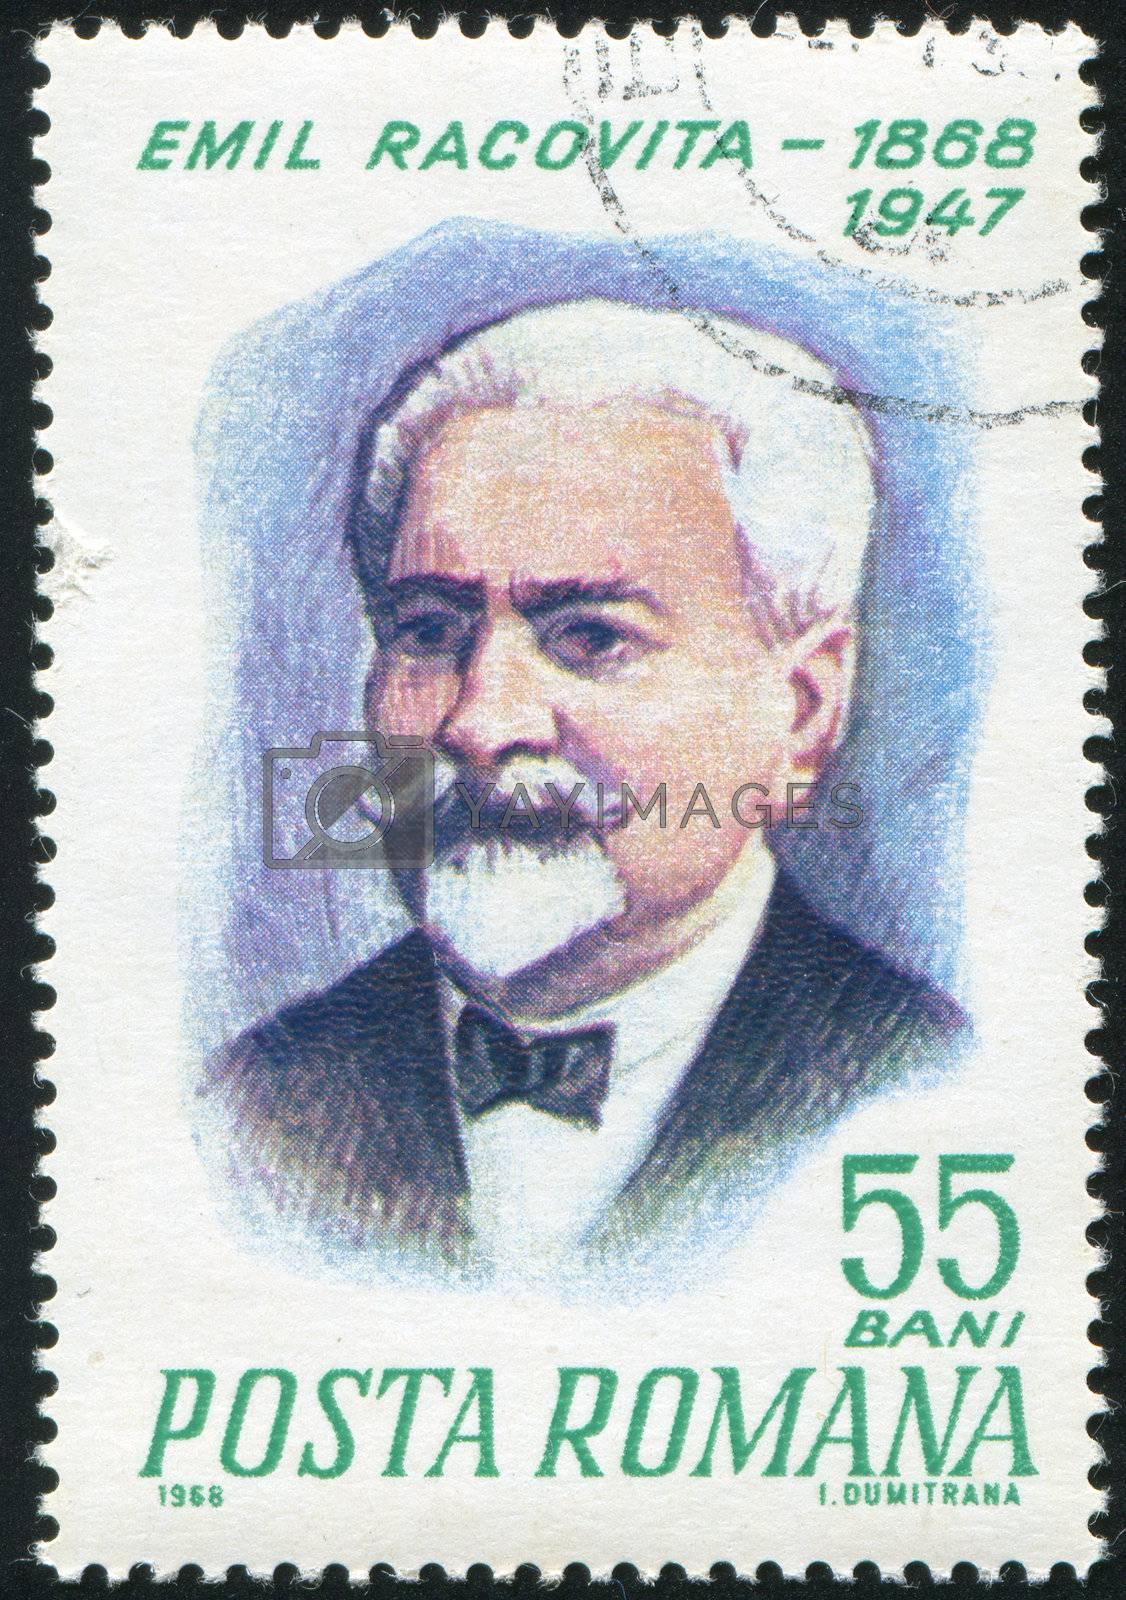 ROMANIA - CIRCA 1968: stamp printed by Romania, show  Emil Racovita, circa 1968.